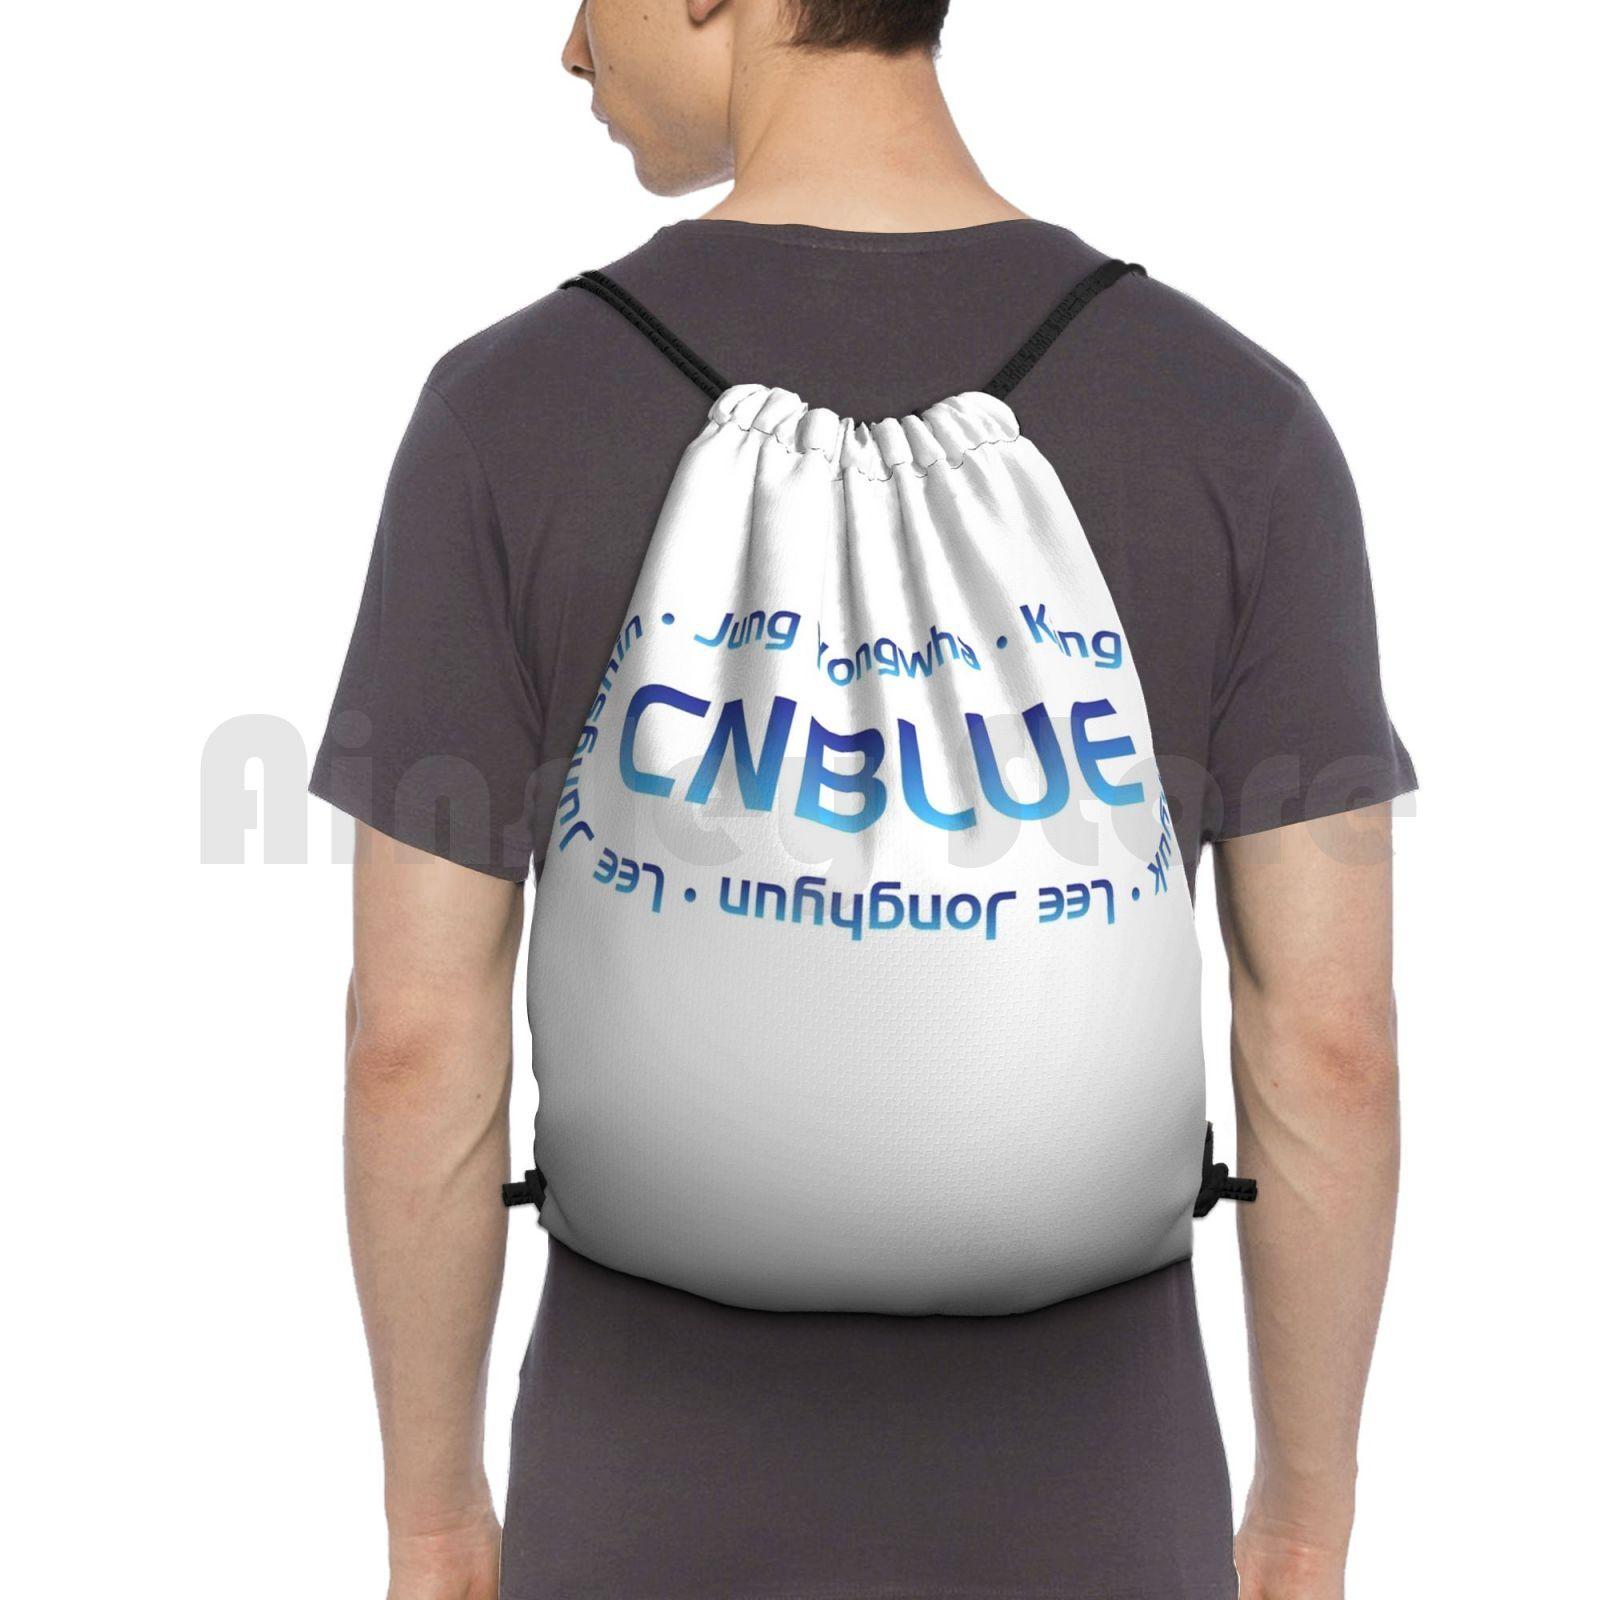 Cnblue رباط سحب لحقيبة ظهر حقيبة قاعة رياضة مقاوم للماء Cnblue Yongwha Jung Yongwha Jonghyun لي Jonghyun Minhyuk كانغ Minhyuk